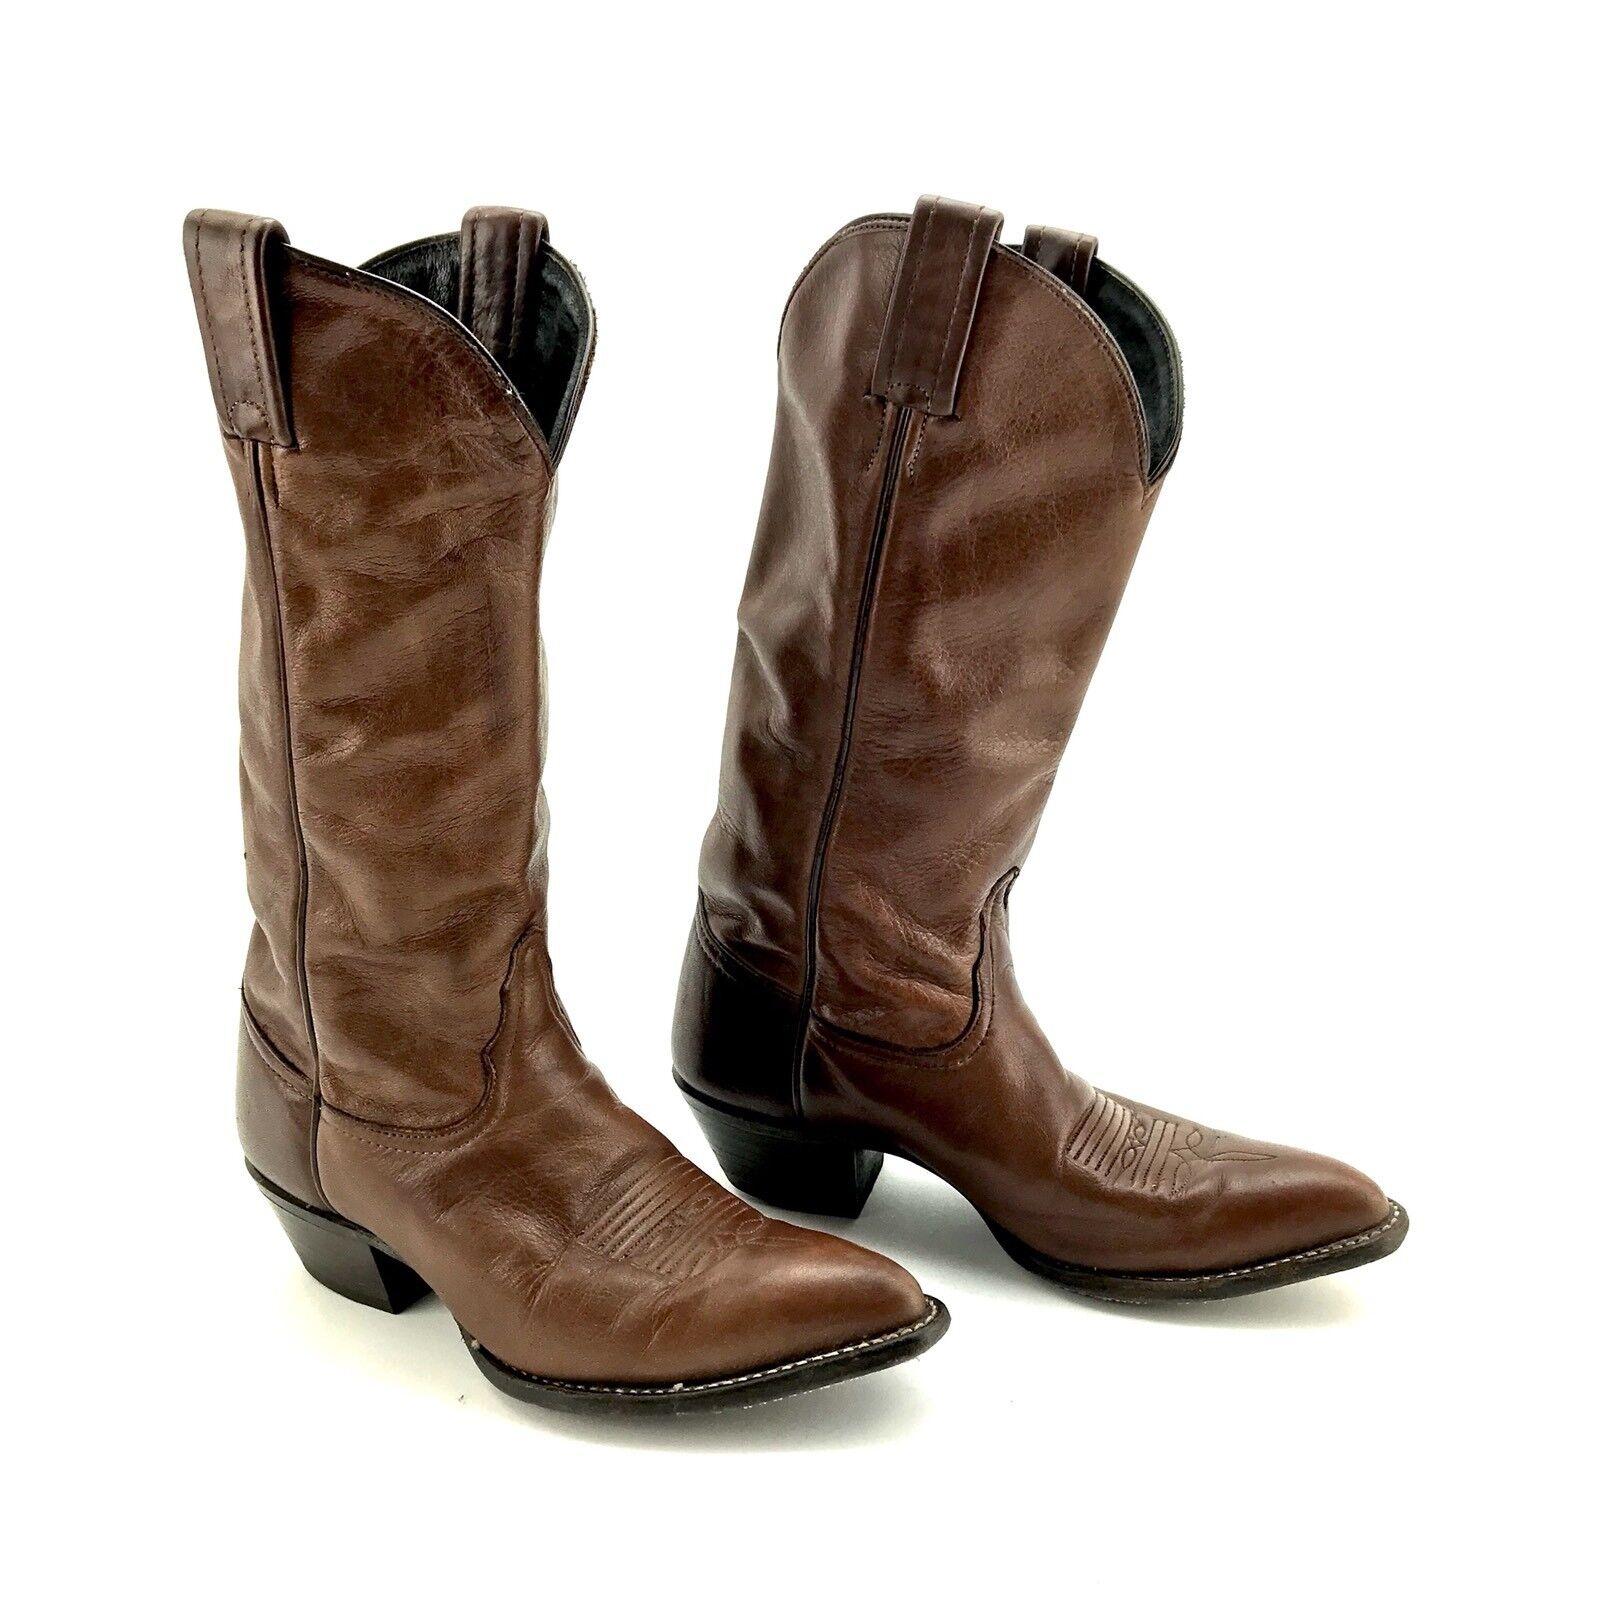 TONY Lama Marrone Pelle Stivali Da Cowboy Stile Vintage Taglia REG 1014 L 6 M REG Taglia 17415376 7a77ee